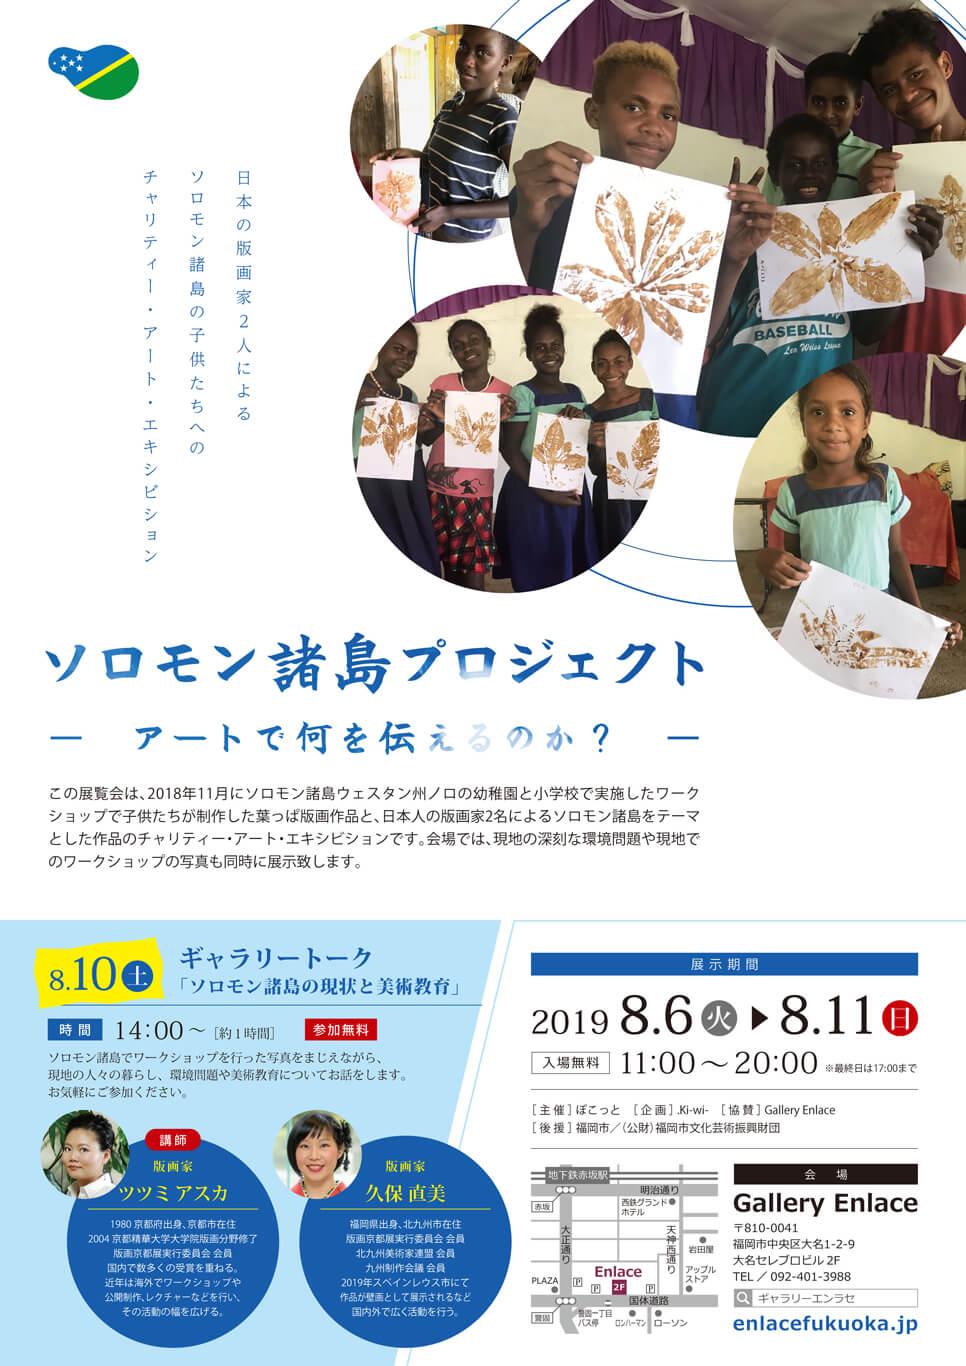 enlc-201908-ツツミ アスカ 久保 直美 展覧会